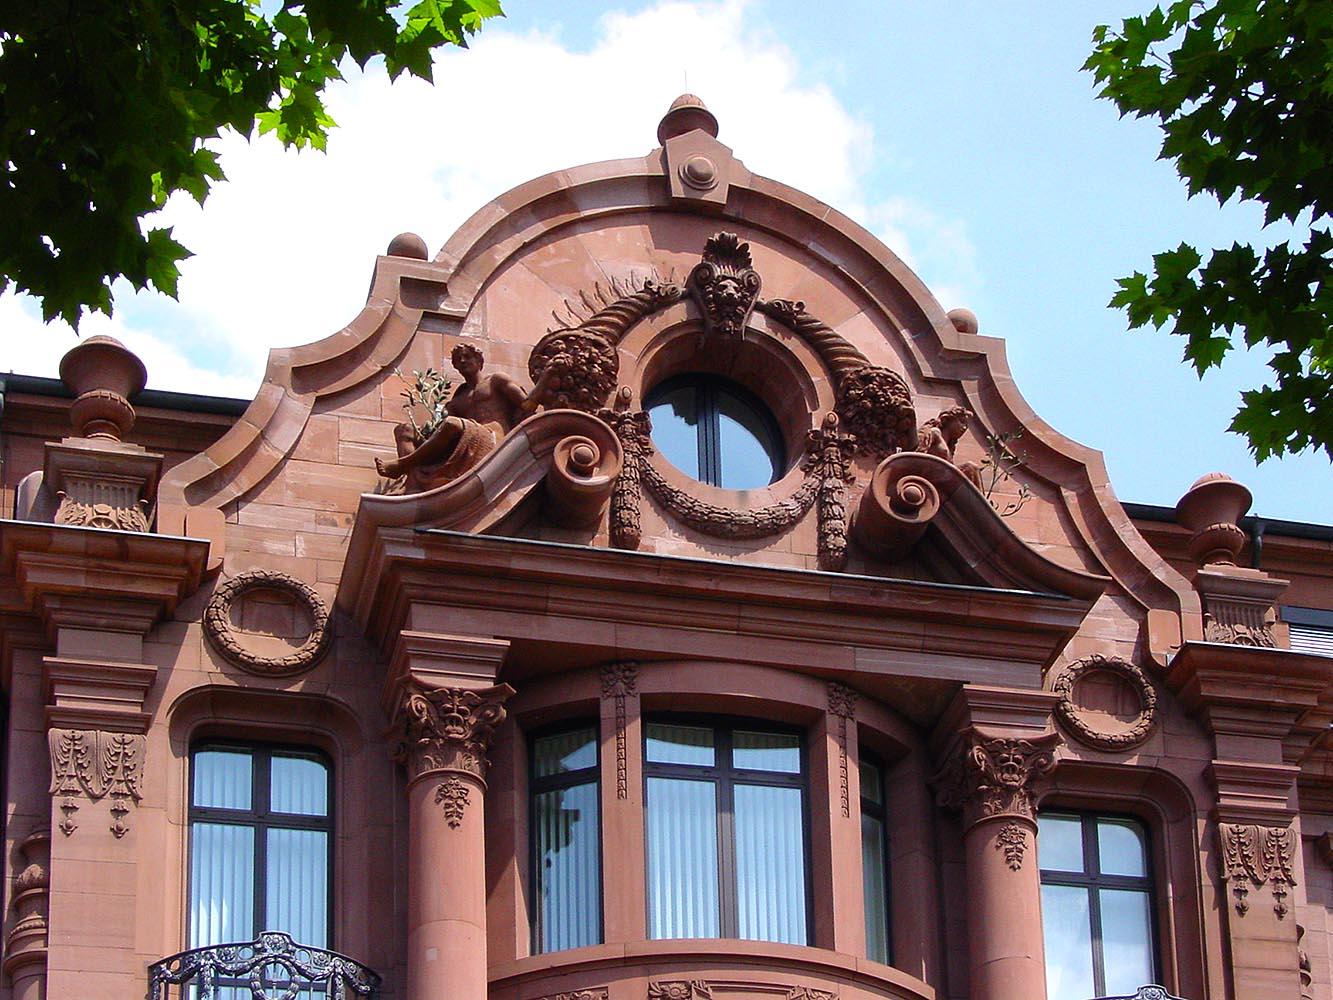 LBBW, Mannheim